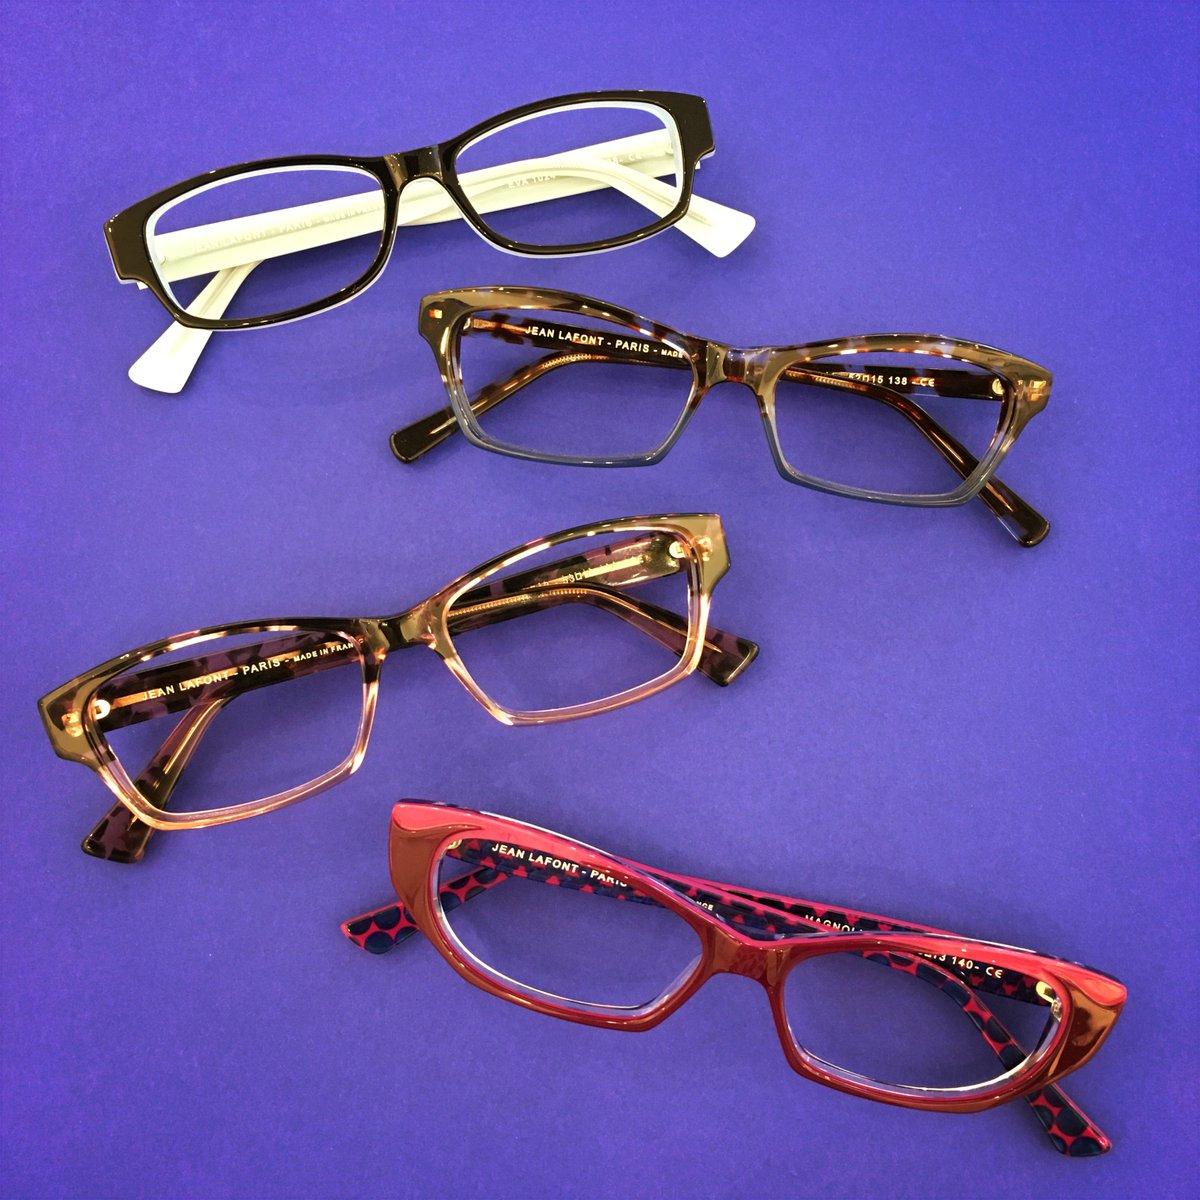 Jean lafont eyeglasses frames - 0 Replies 2 Retweets 3 Likes